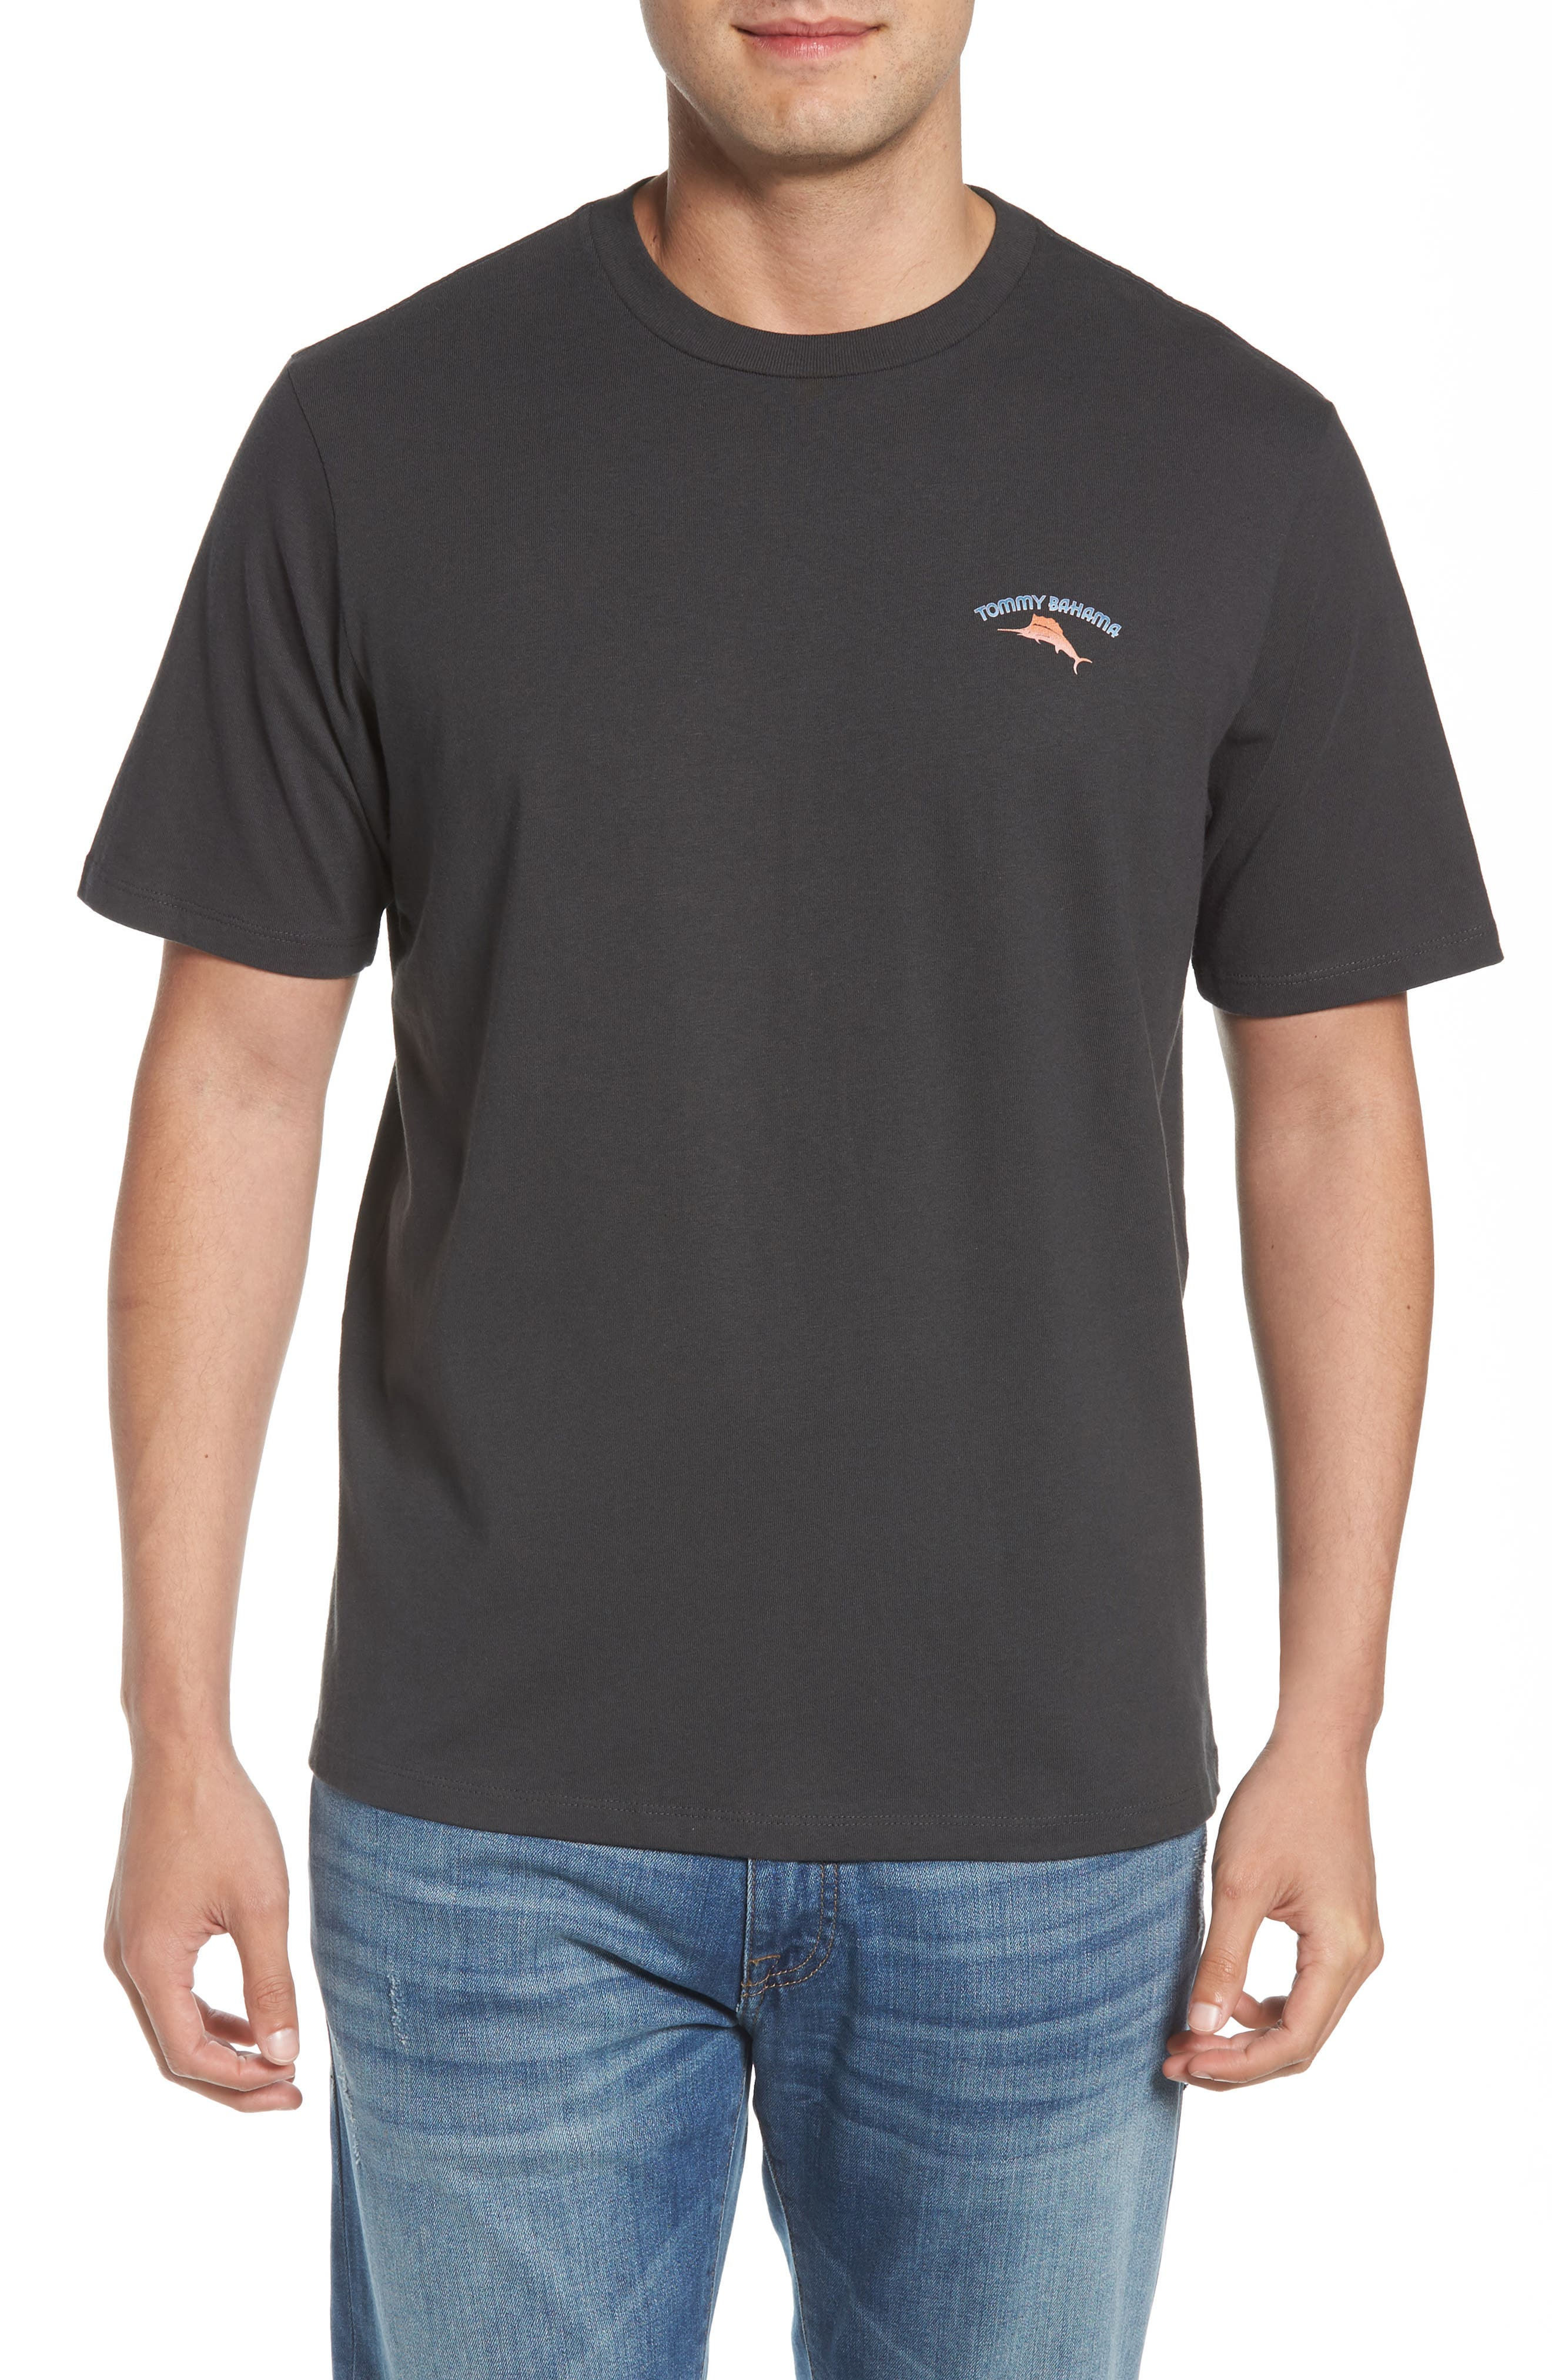 Bromingos T-Shirt,                         Main,                         color, Coal